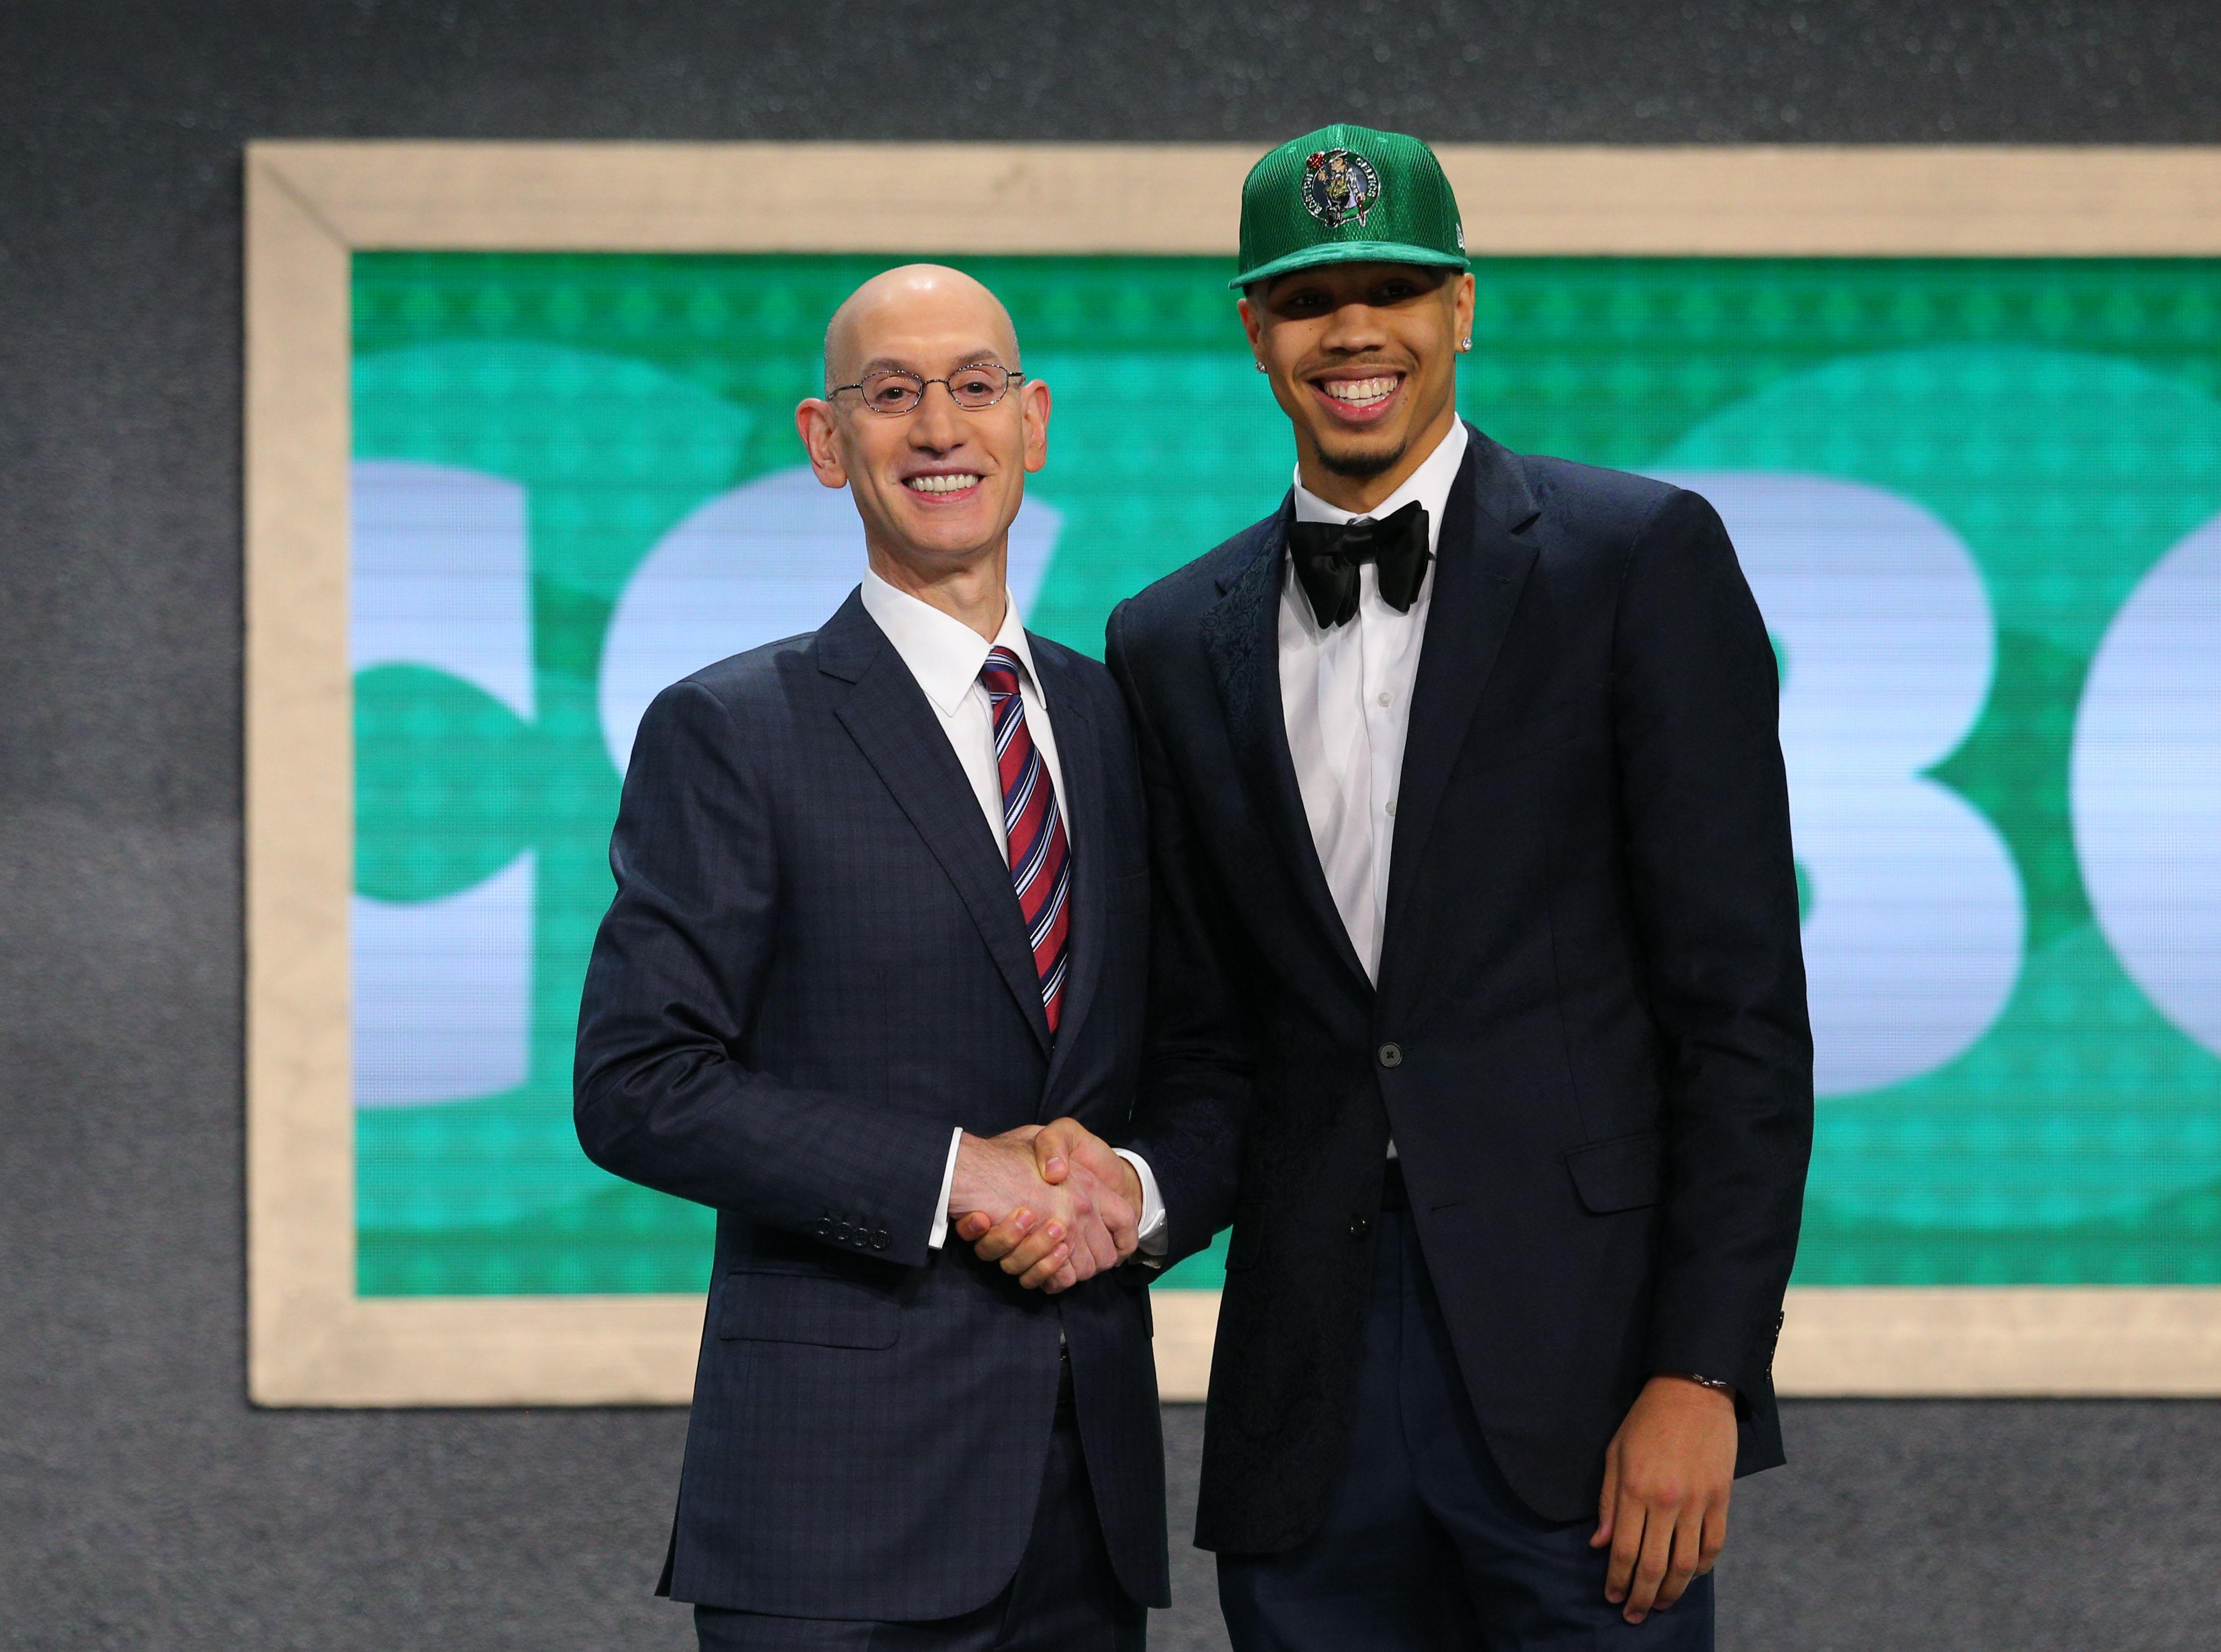 Nba Draft: Boston Celtics: 2017 NBA Draft Grades For Jayson Tatum